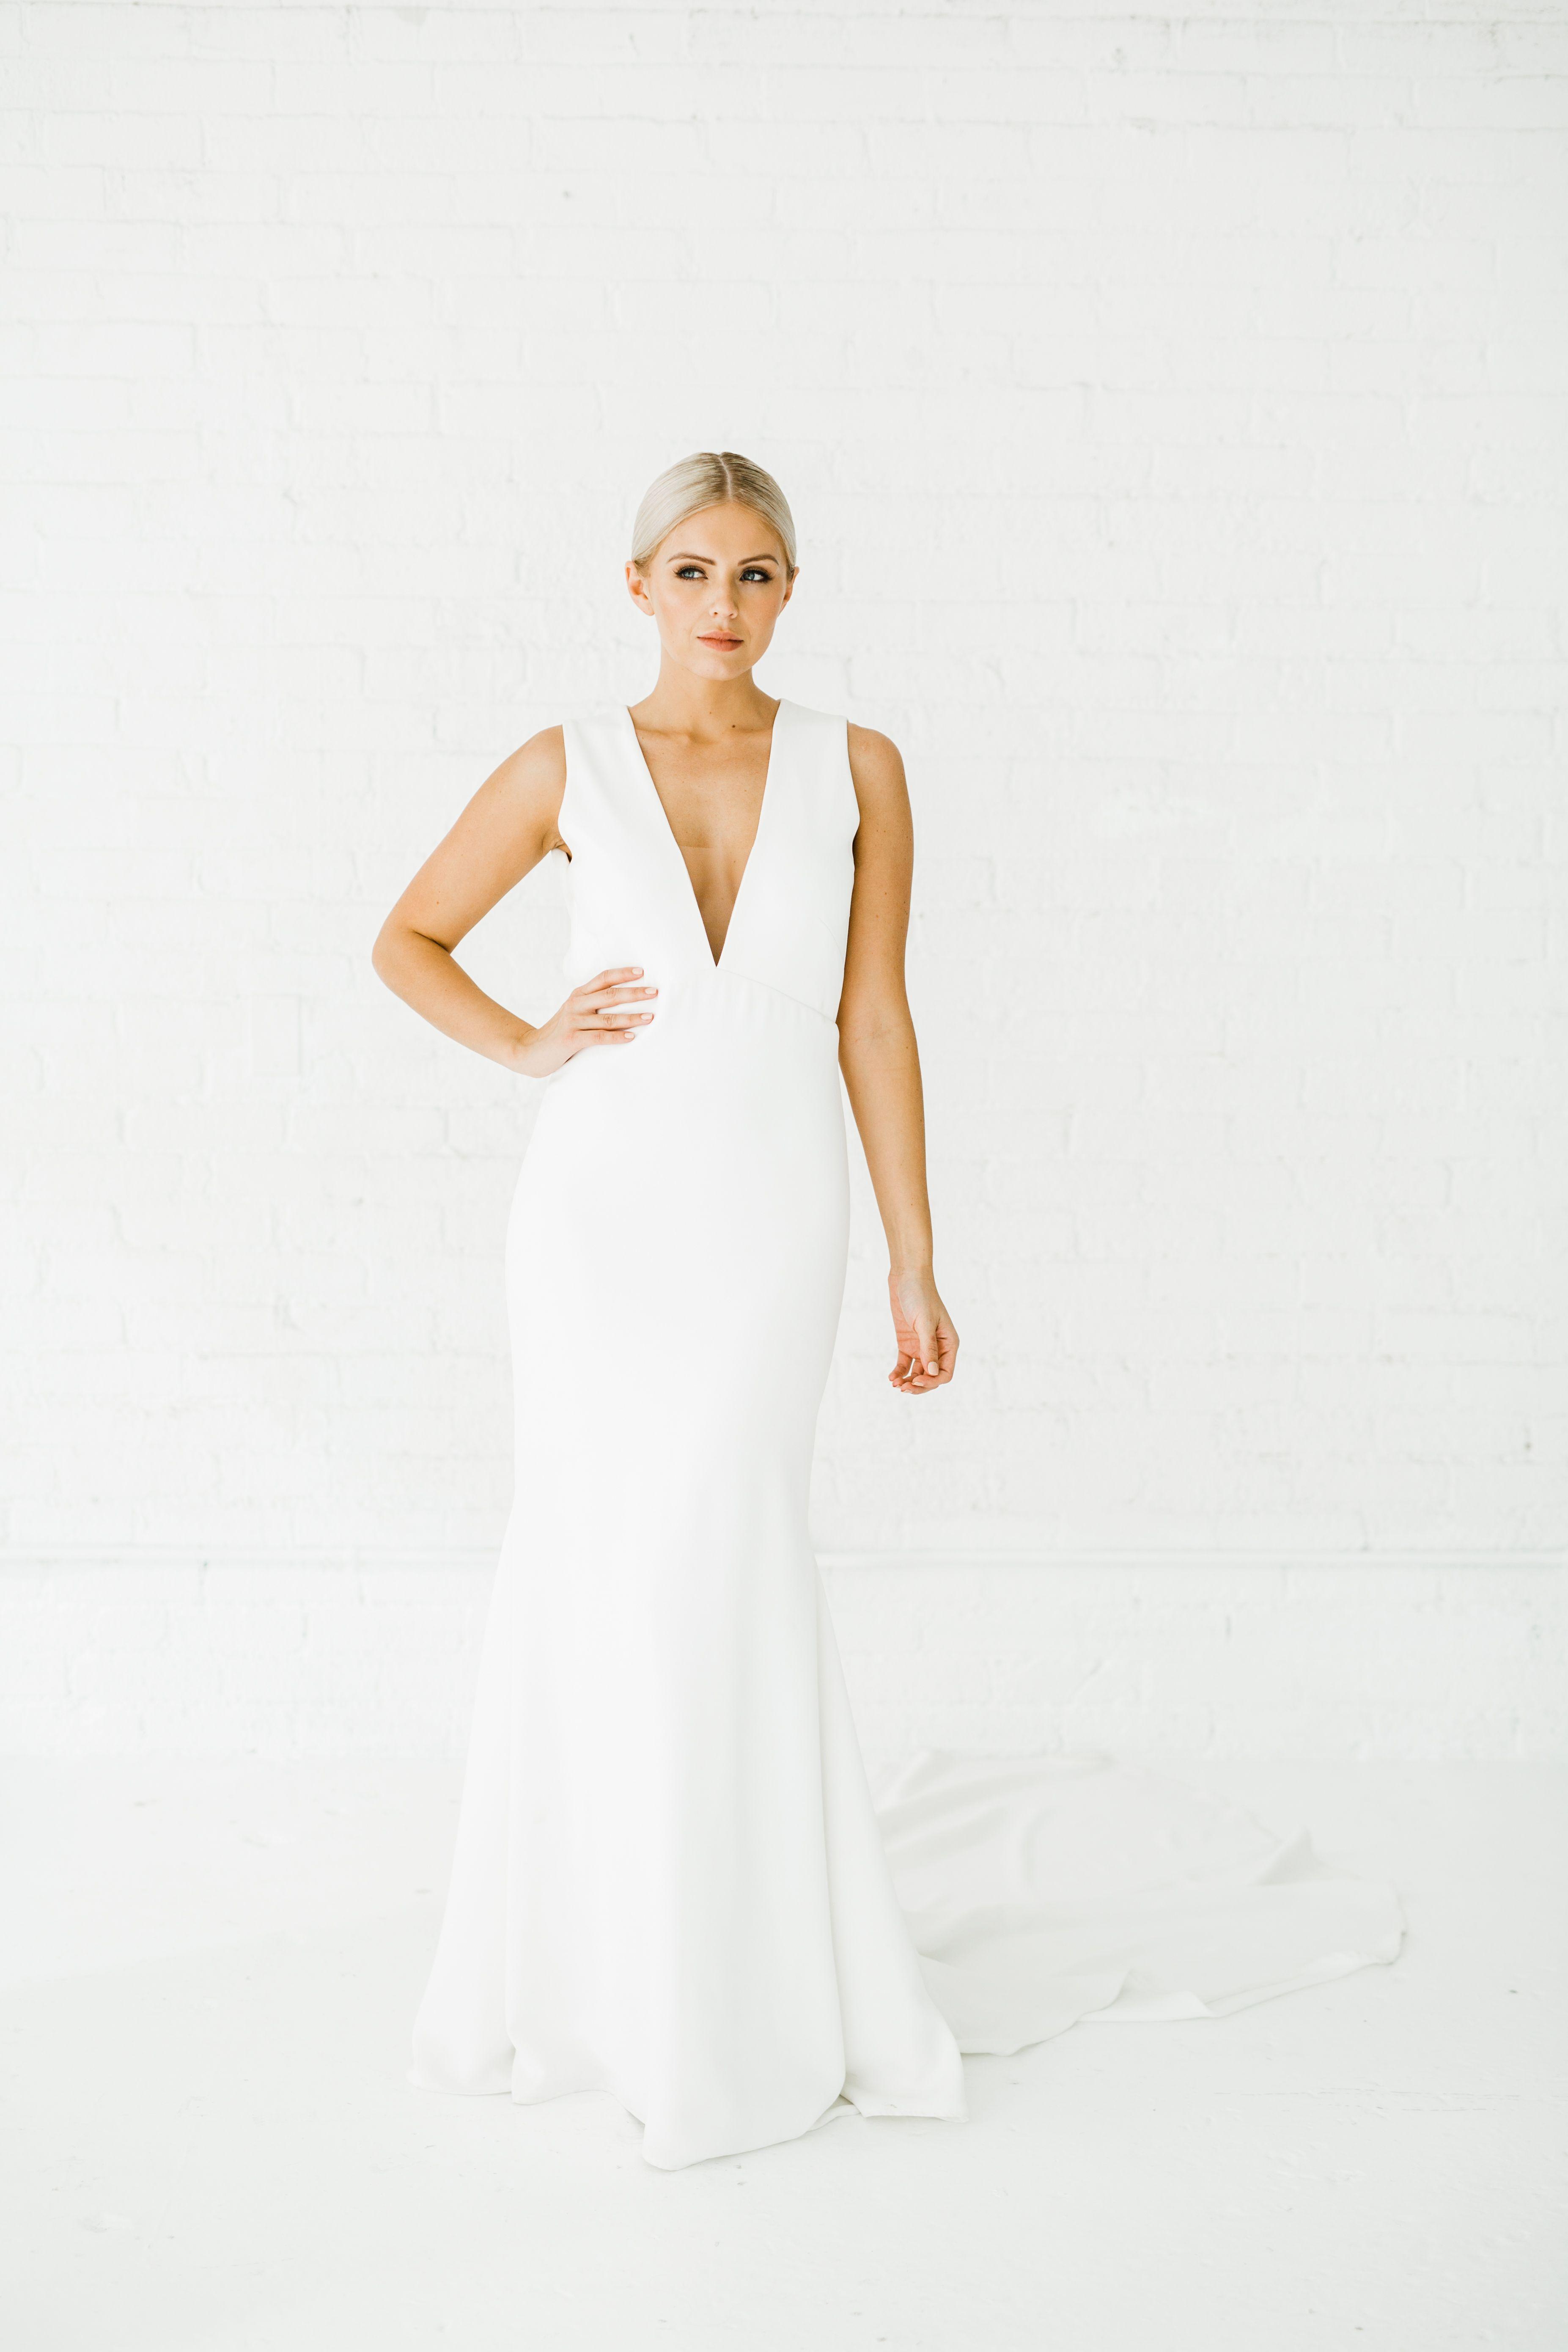 Marlow Alyssa Kristin Chicago Wedding Dress Designer Agnes Rasek Photography Dramatic Wedding Dress Wedding Dress Prices Fitted Wedding Dress